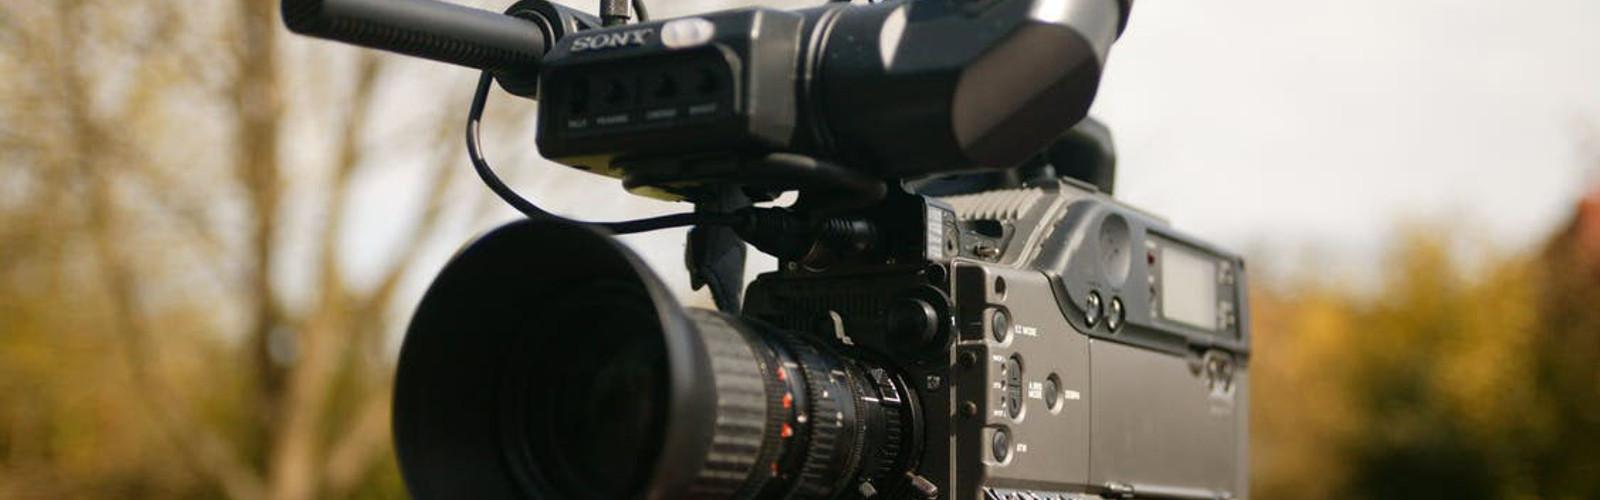 Video Marketing Strategies for Contractors 1